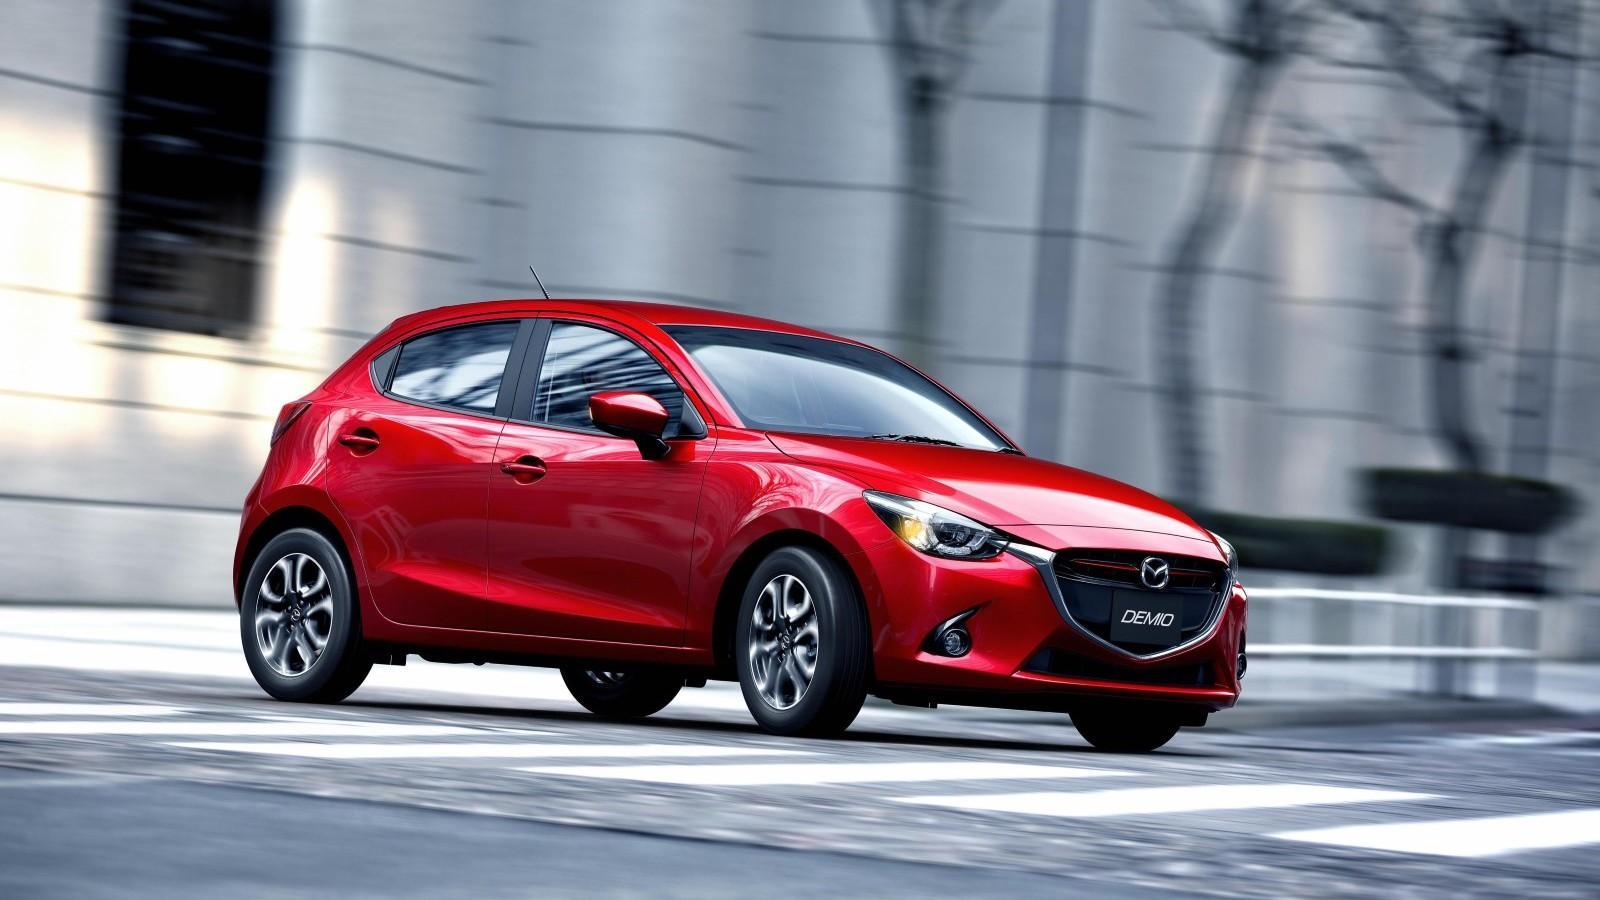 Kelebihan Kekurangan Mazda Skyactiv G Tangguh